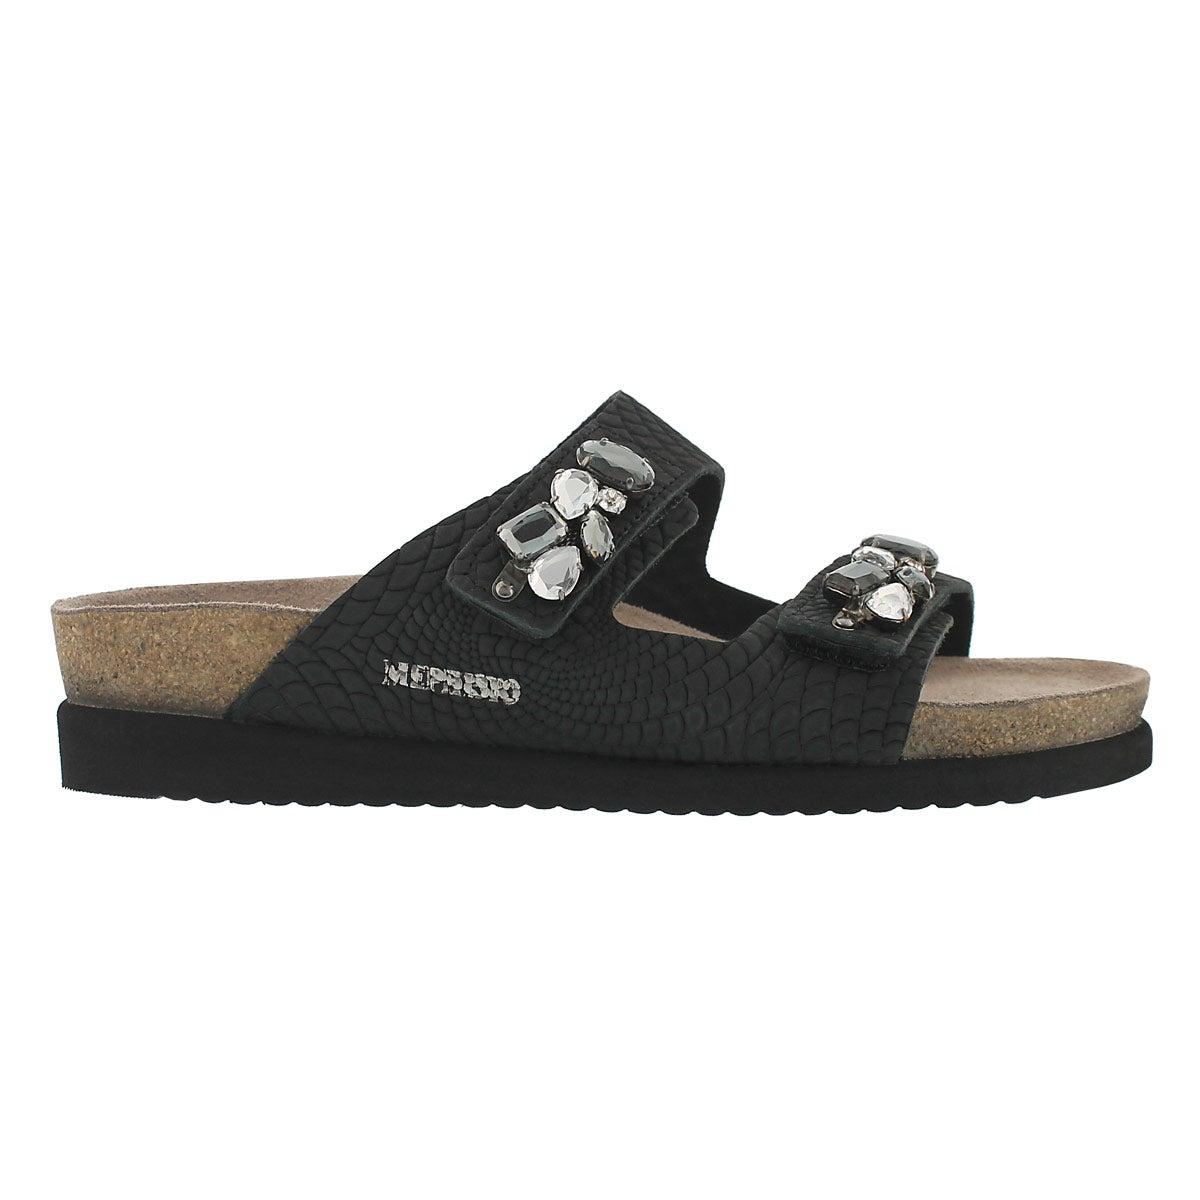 Lds Hana blk rio cork footbed sandal